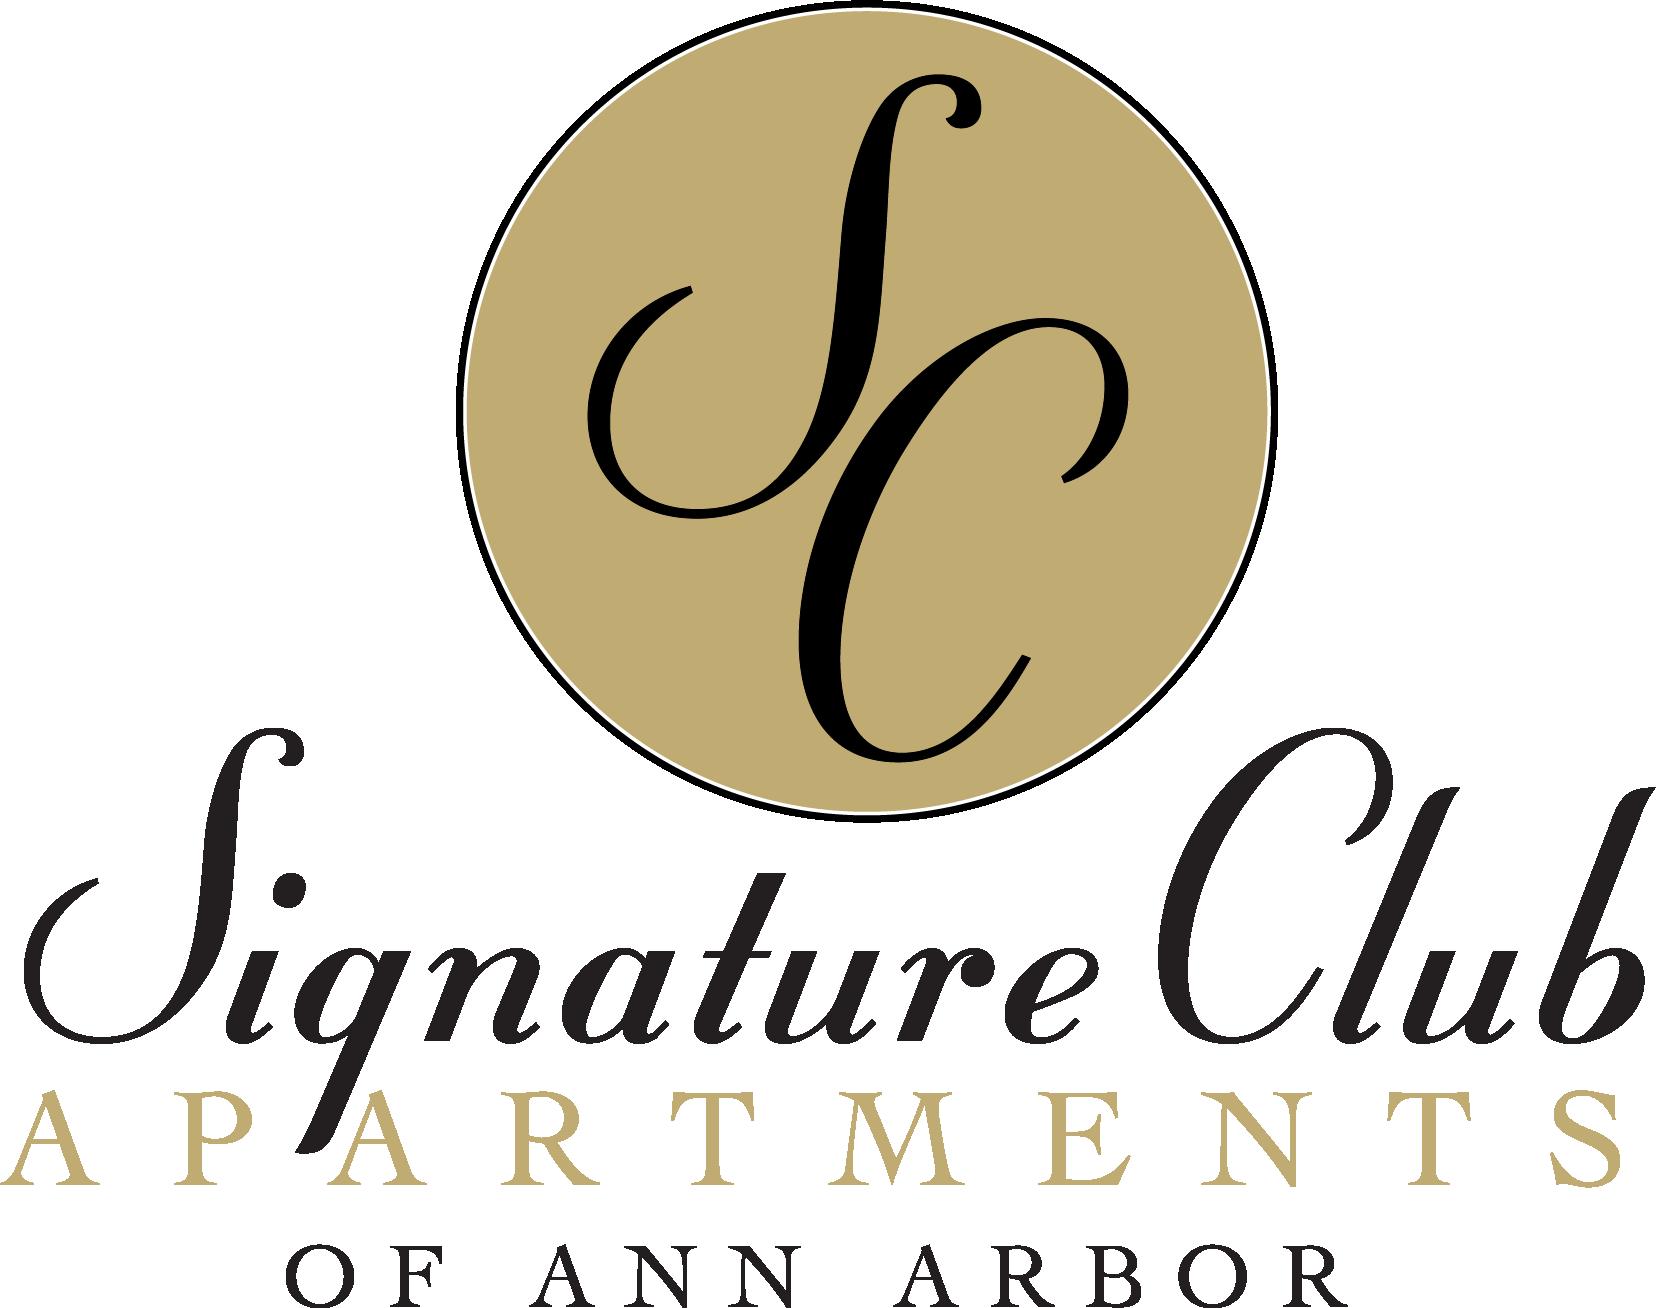 Signature Club Apartments Signature Club Apartments